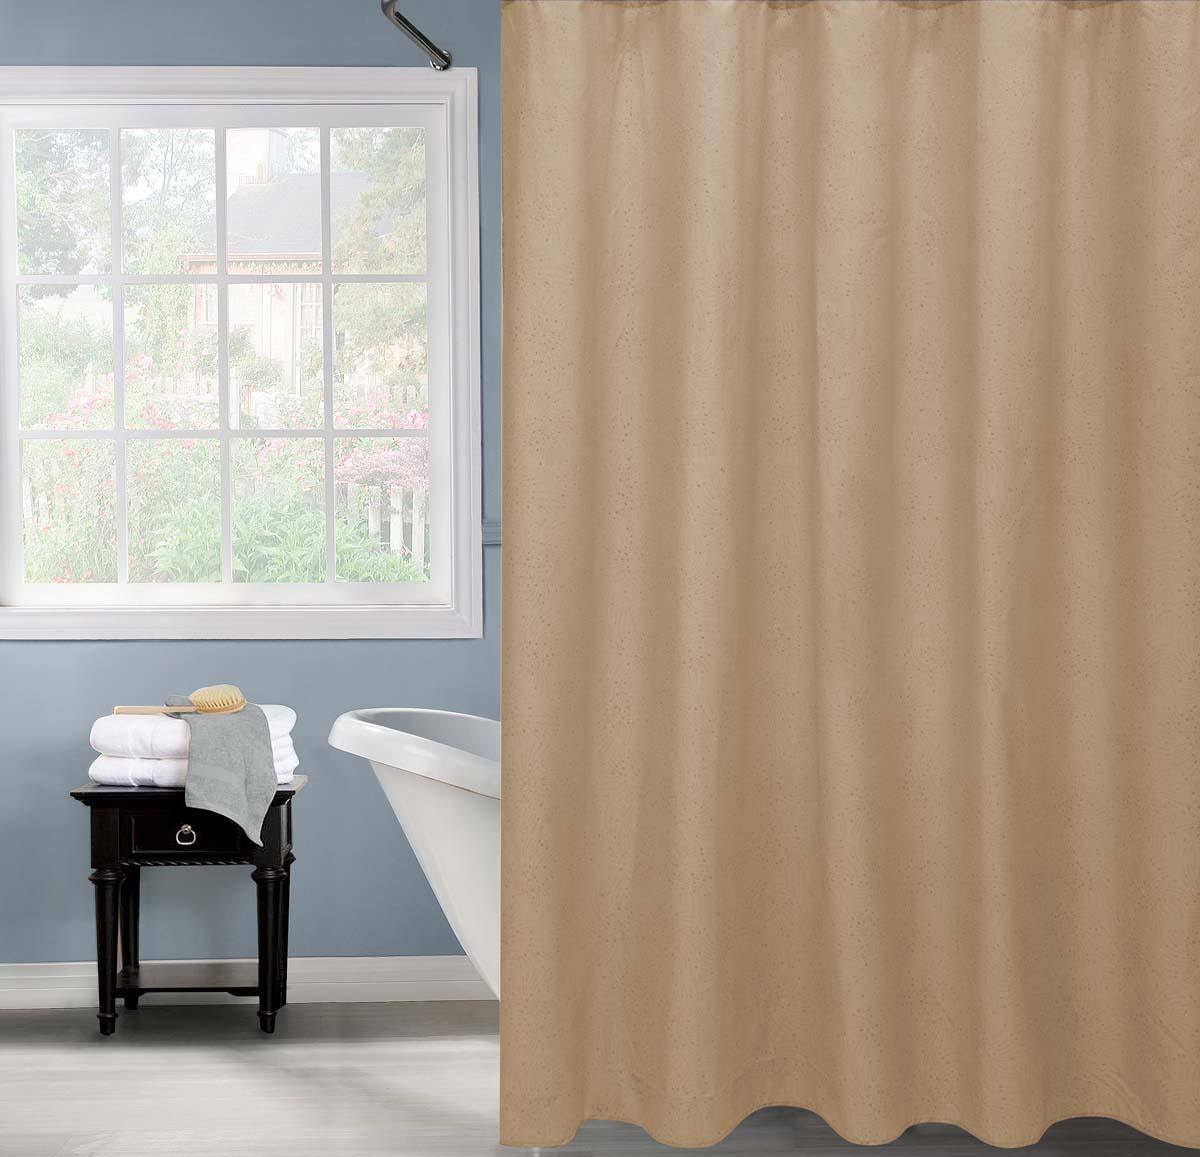 Штора для ванной Swensa Salvo, цвет: бежевый, 180 х 200 см штора для ванной swensa анкона цвет бежевый 180 х 180 см